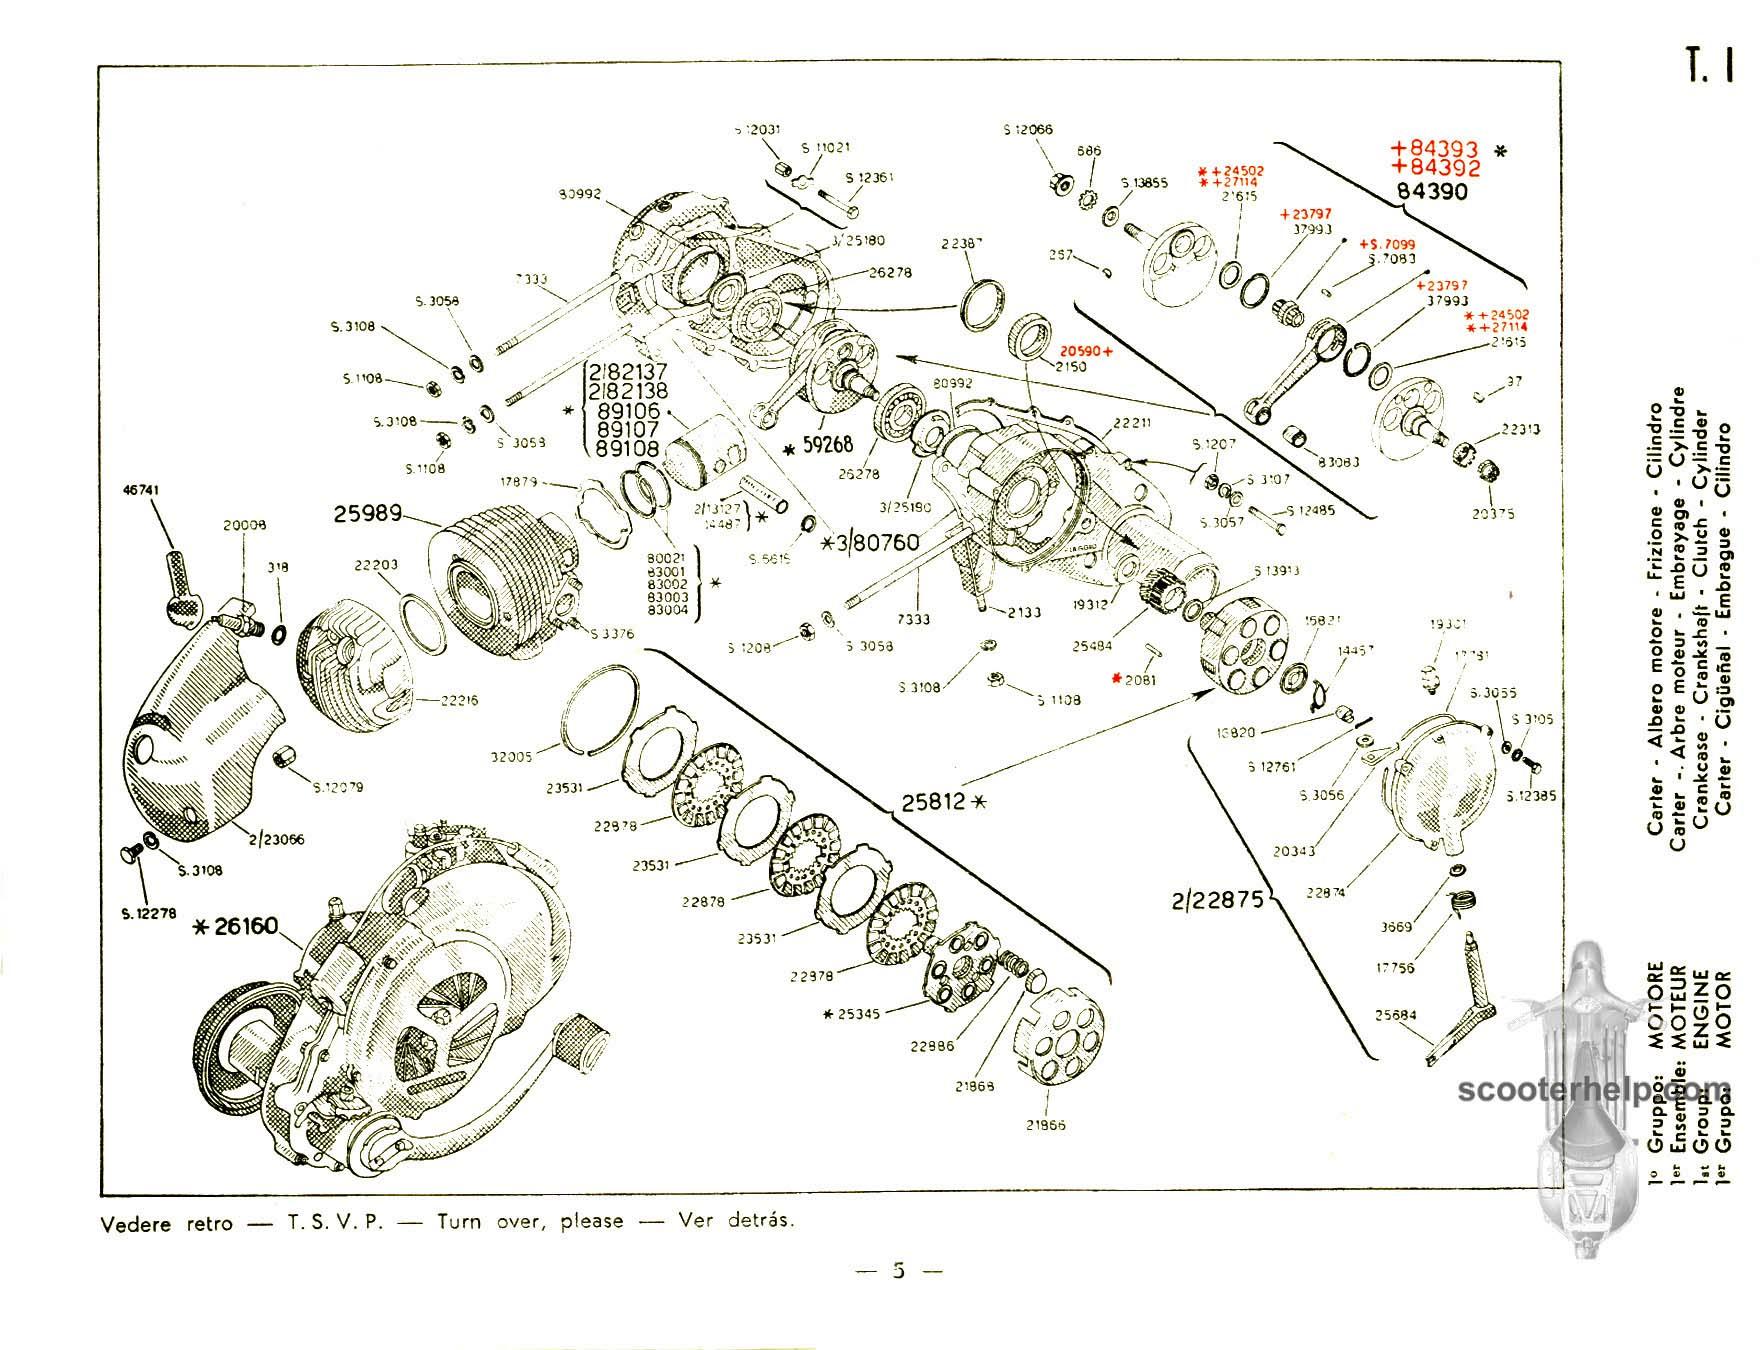 harley davidson service manual dyna glide models 1995 1996 official factory manual